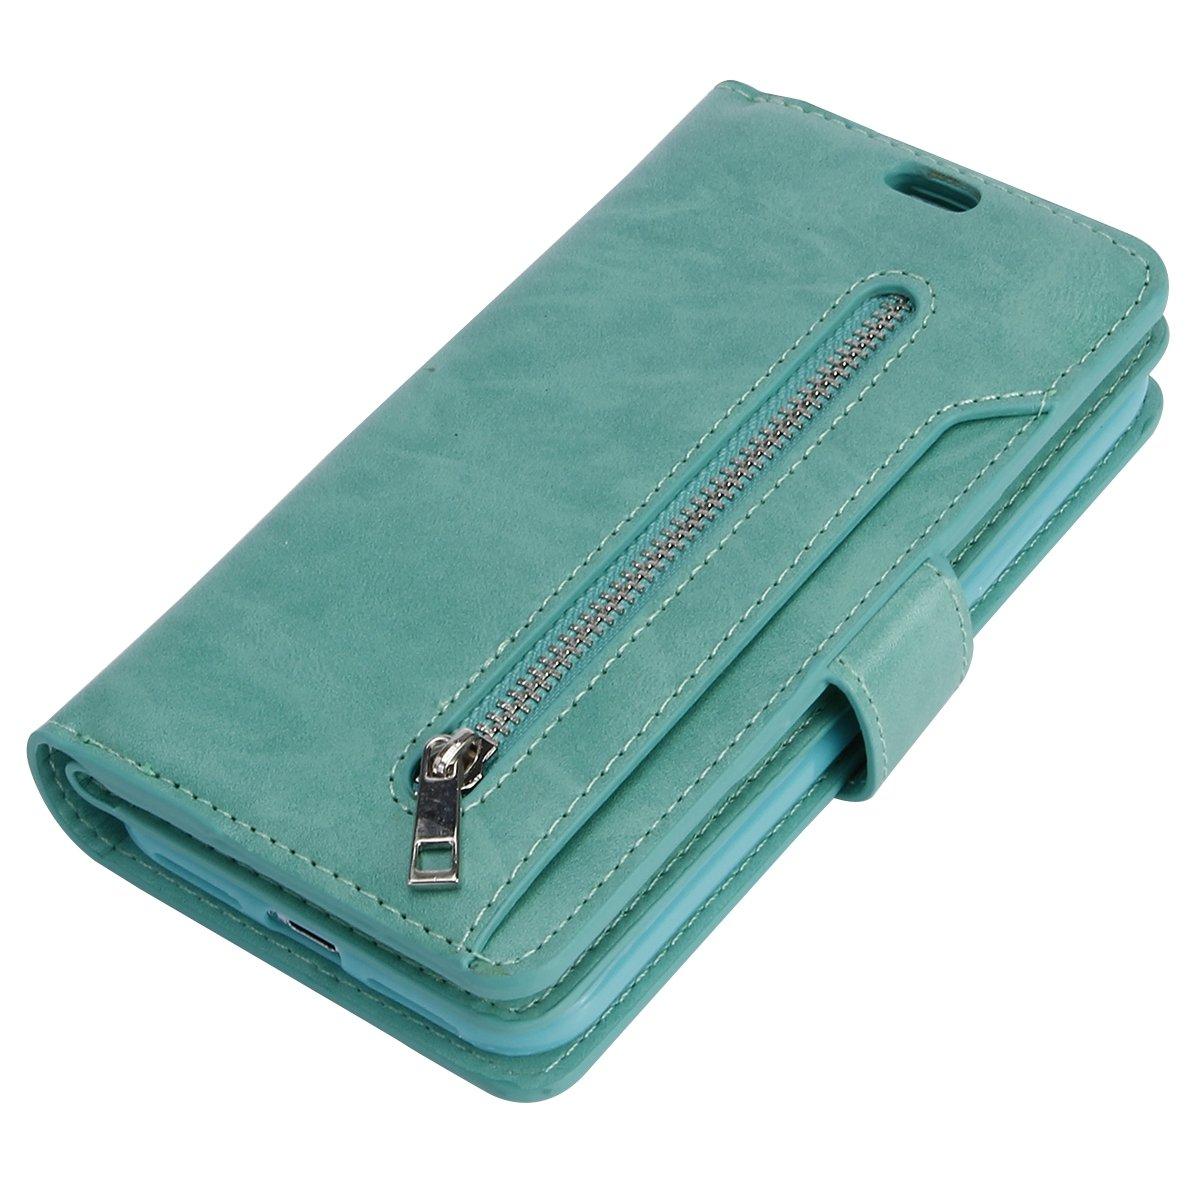 Lederh/ülle HandyH/ülle-Braun 9 Karten Slot Jinghuash Kompatibel mit iPhone X//XS H/ülle PU Leder Flip Case Brieftasche Ledertasche Tasche Klapph/ülle Multifunktionaler mit Rei/ßverschluss